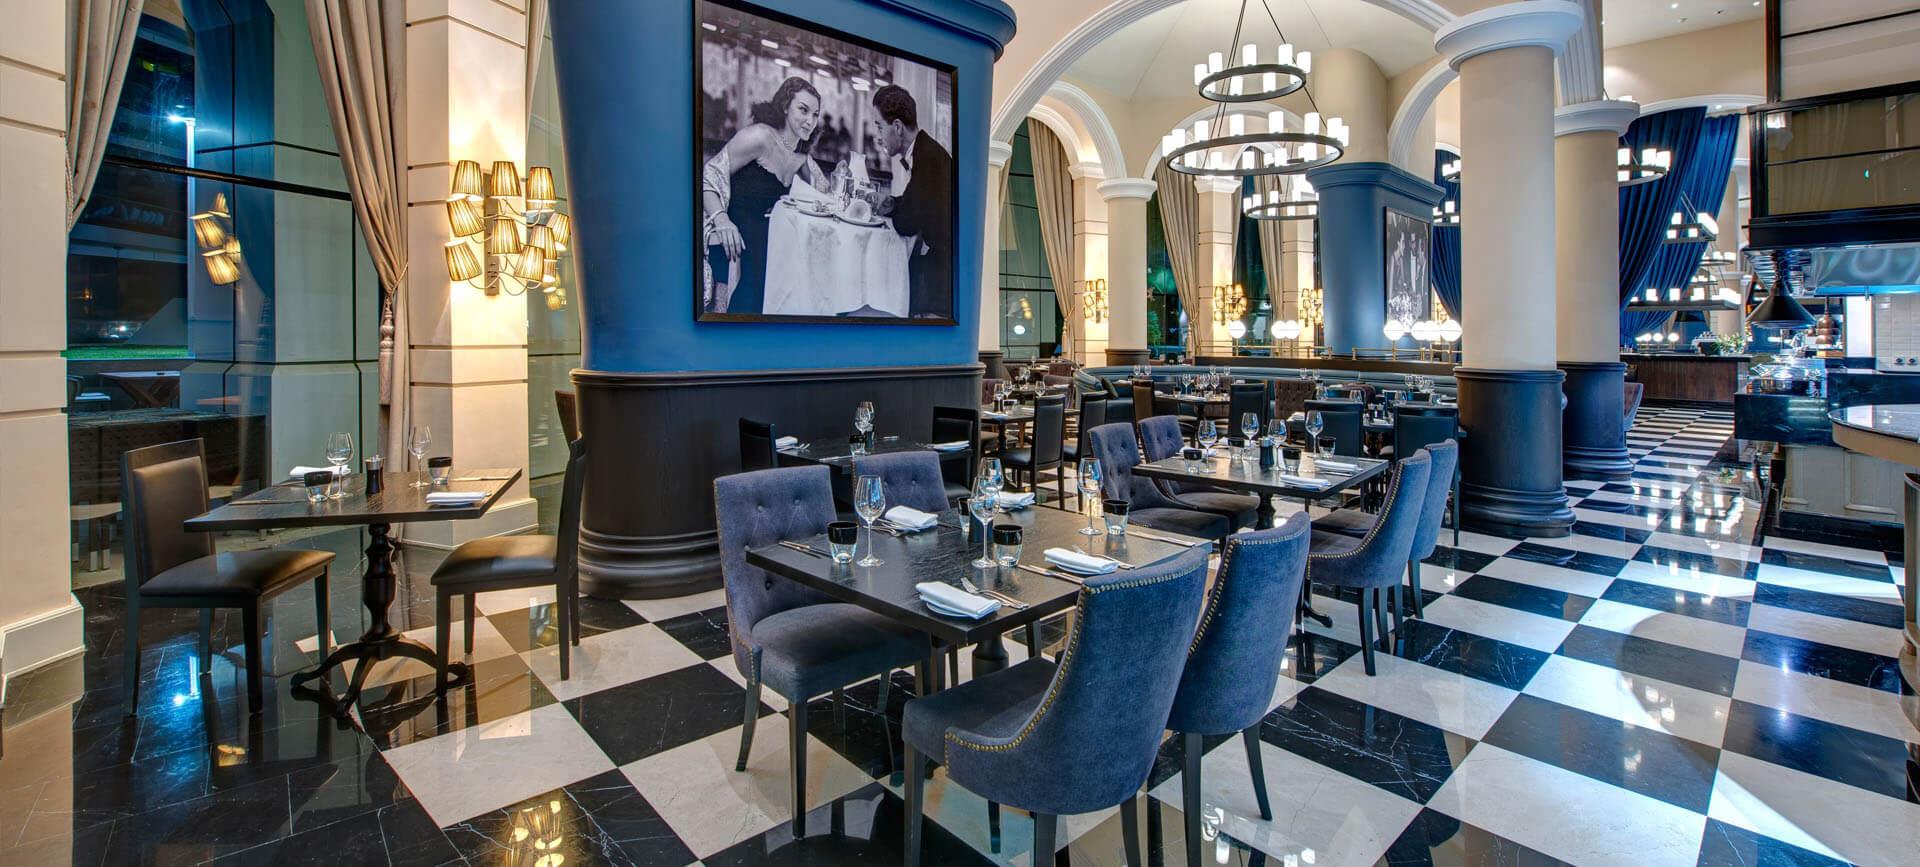 The GrEAT British Restaurant in Mayfair